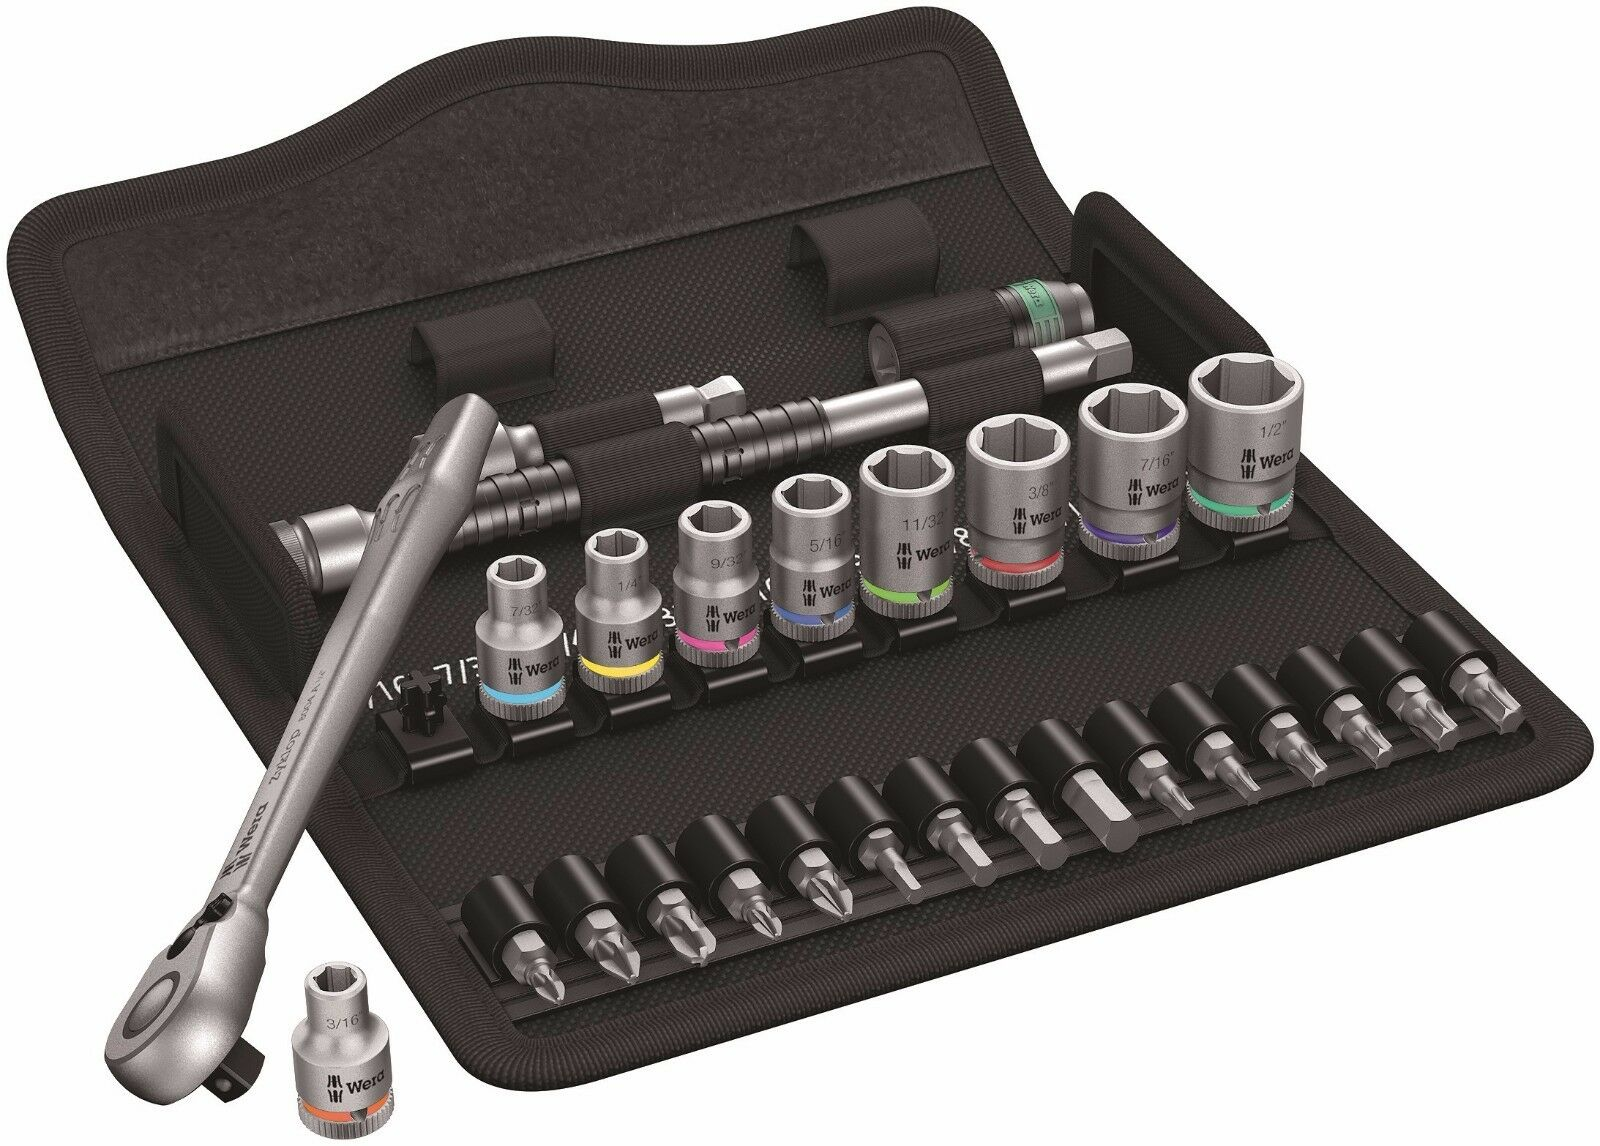 Wera 8100 SA 11 Zyklop Metal Switch Ratchet Set 1/4